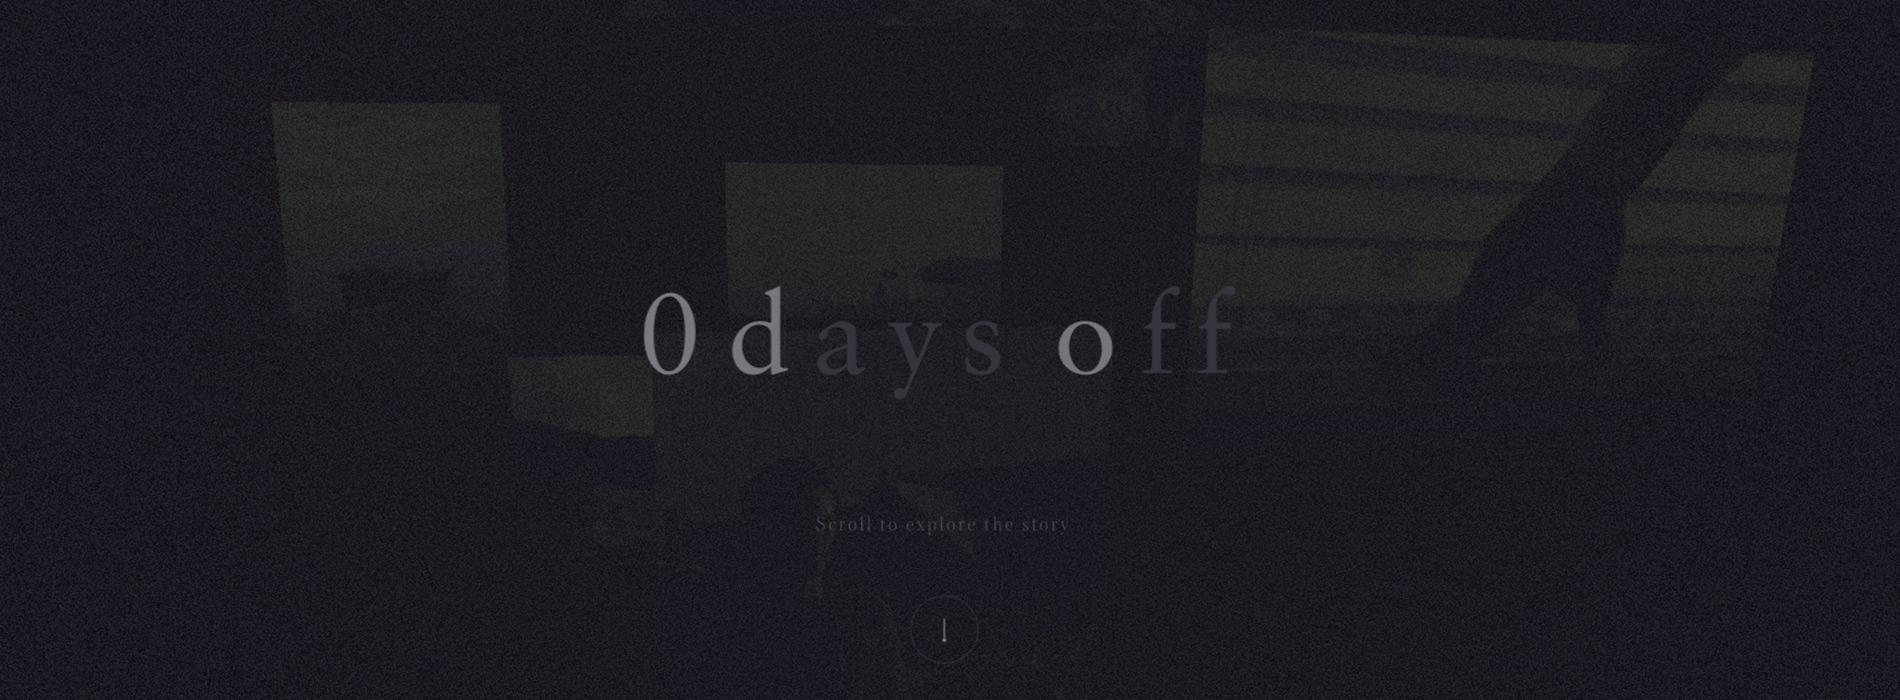 0 days off